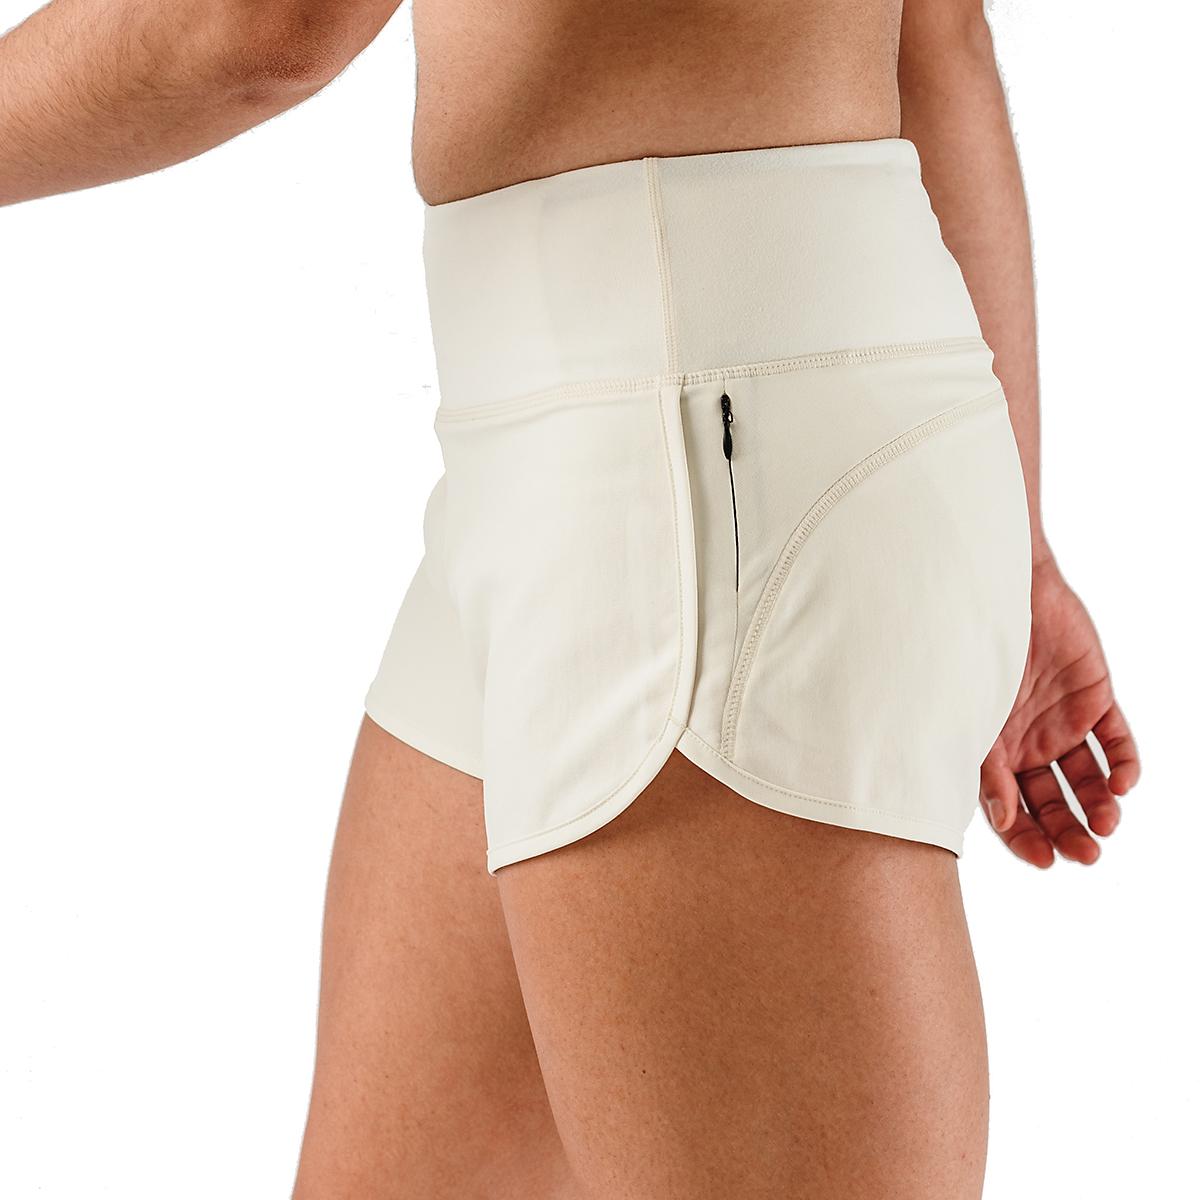 "Women's Rabbit Pocket Shorts 2.5"" - Color: Vanilla Ice - Size: XS, Vanilla Ice, large, image 4"